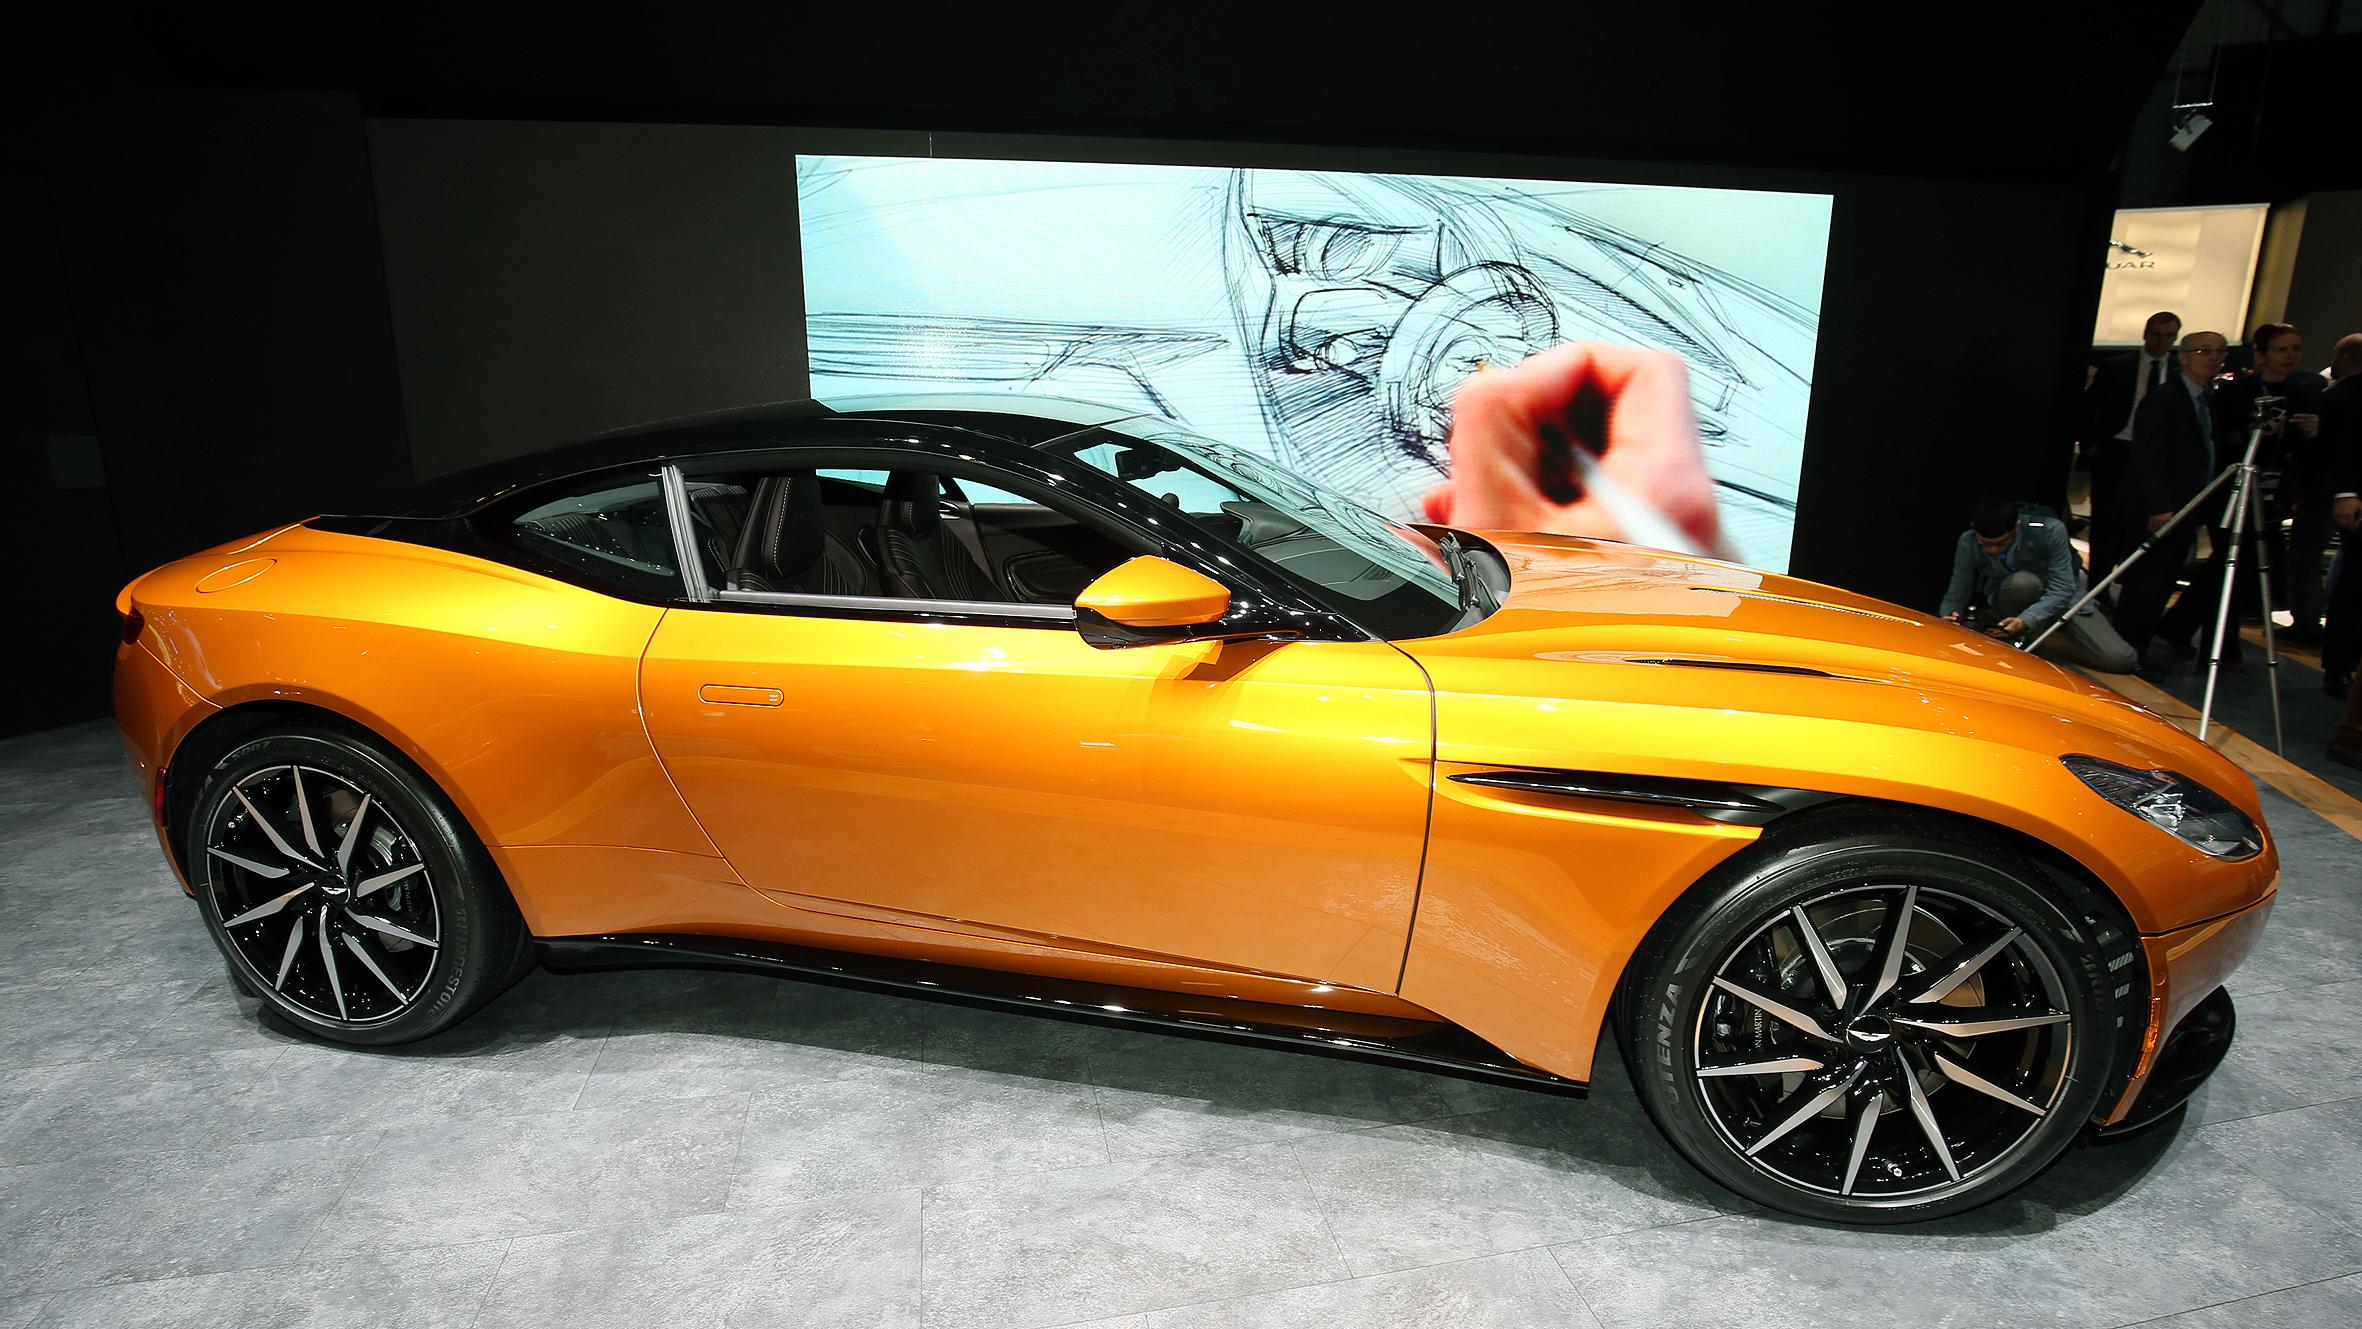 The New Aston Martin DB Its Like Bonds Amazing DB But - Aston martin db 10